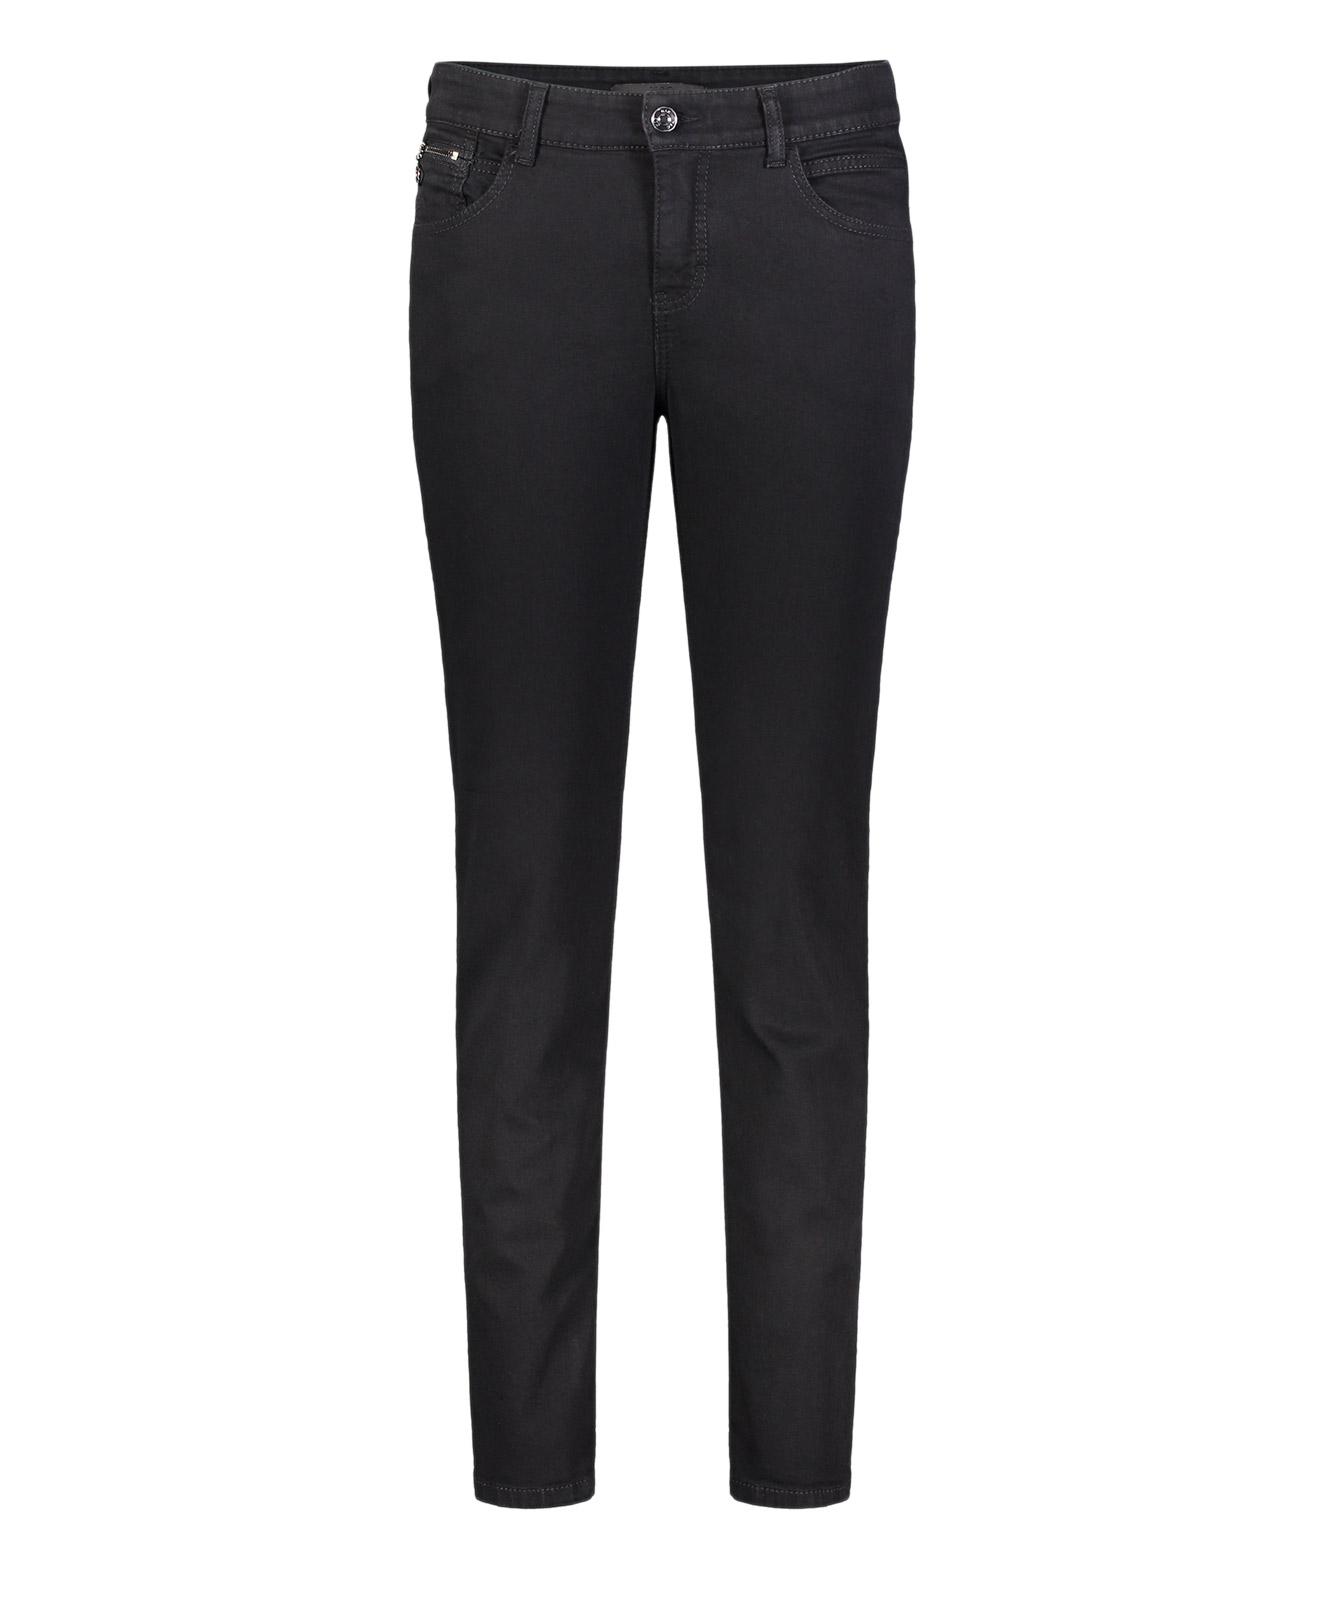 Hosen - MAC Slim Fit Jeans Carrie Pipe in Black Black  - Onlineshop Jeans Meile